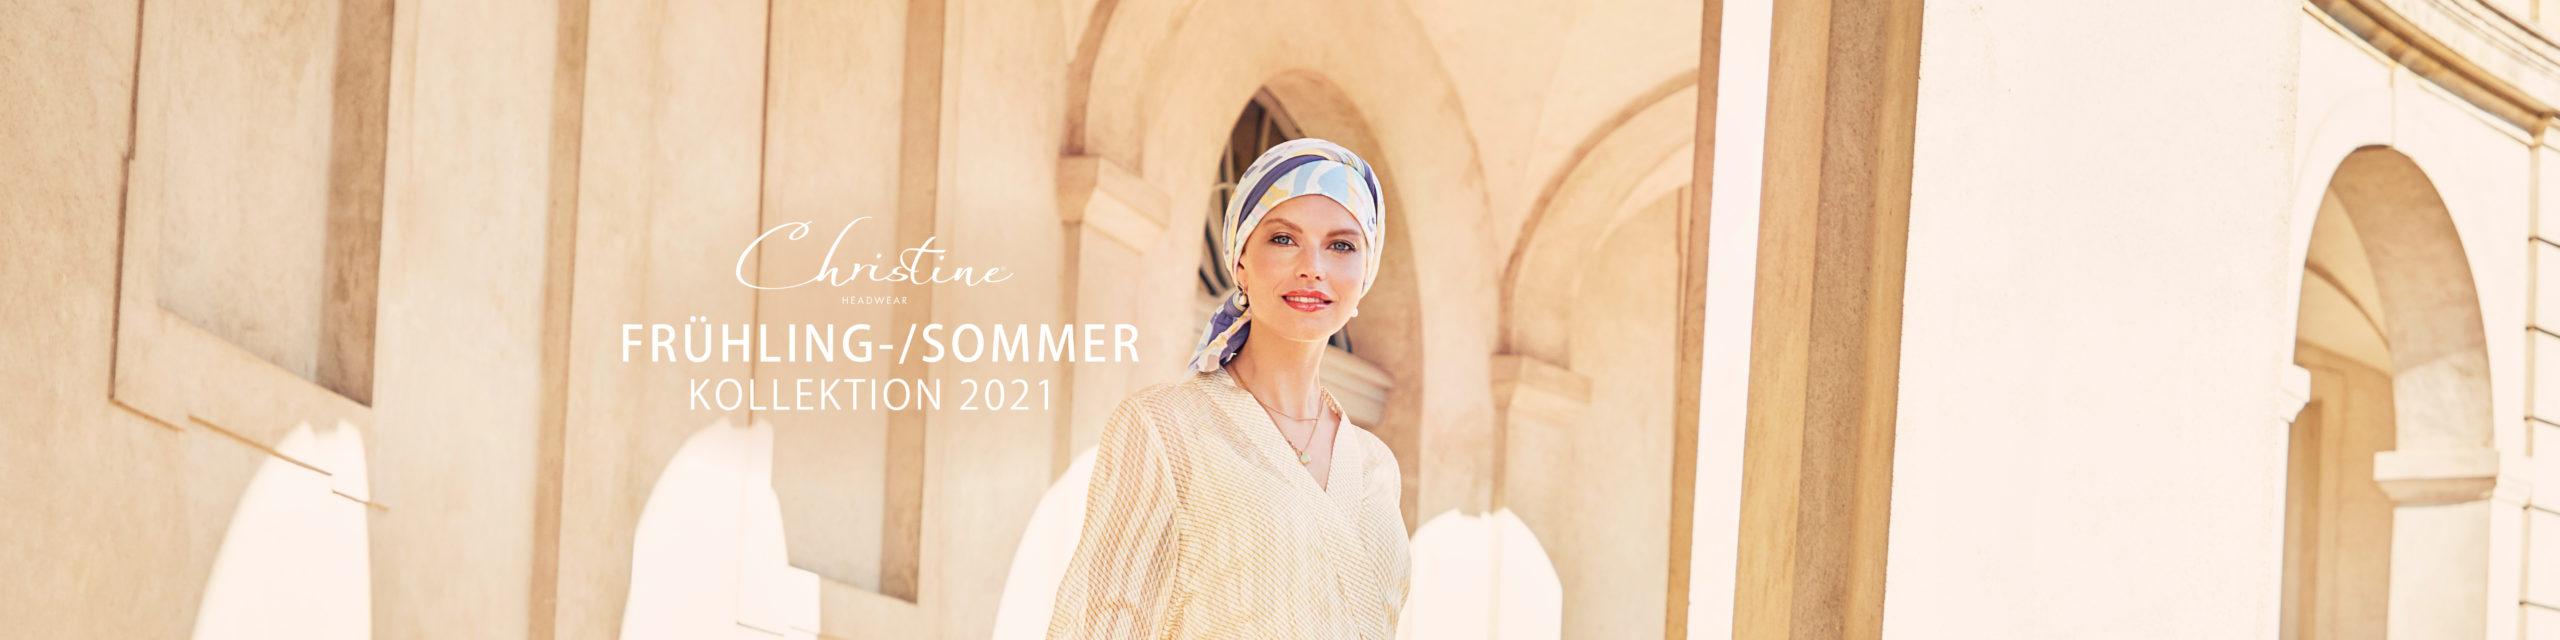 Christine Headwear Frühjahr/Sommer Kollektion 2021